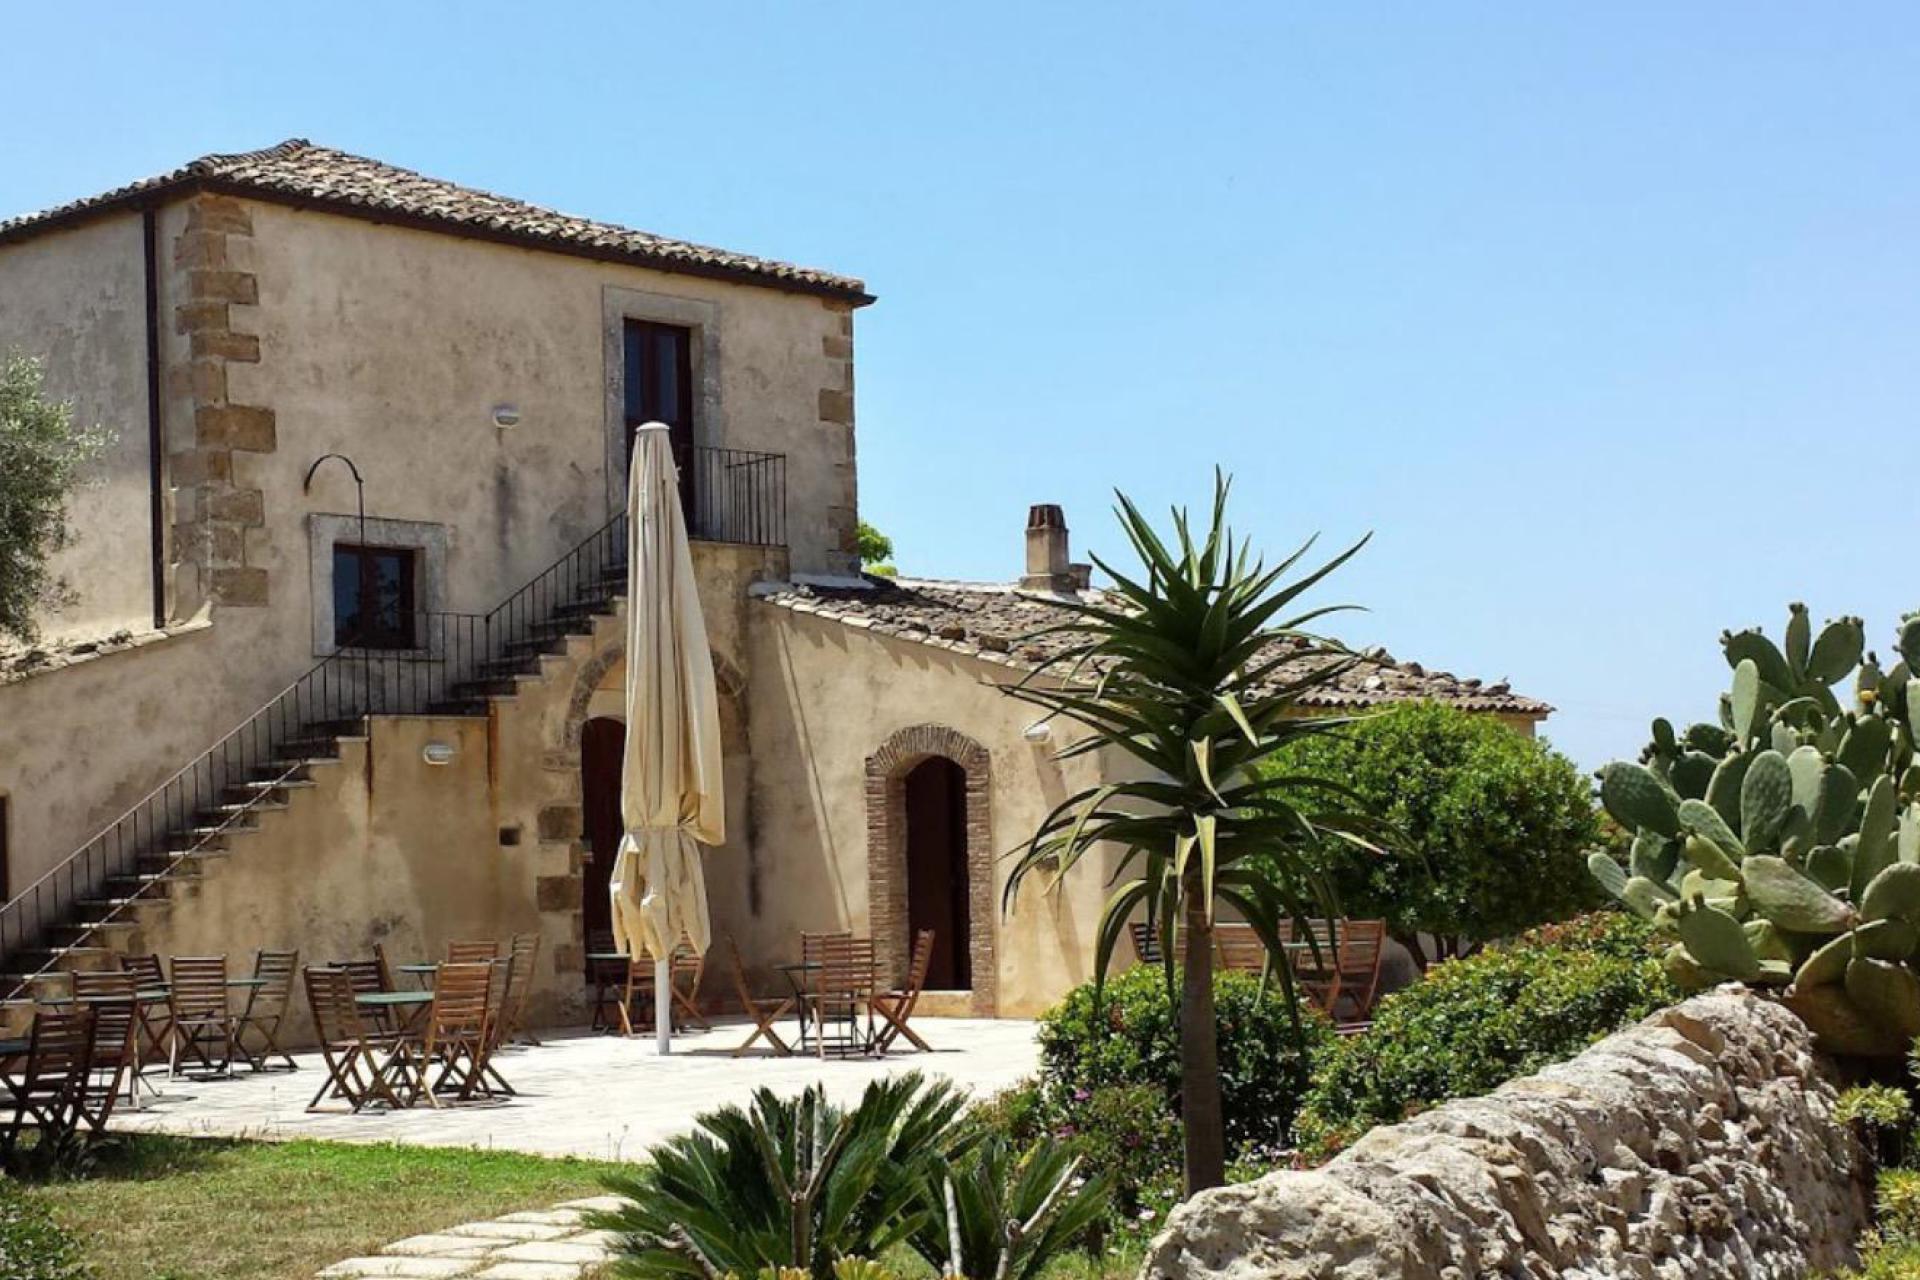 Agriturismo Sicilia Comodo agriturismo in Sicilia con ristorante